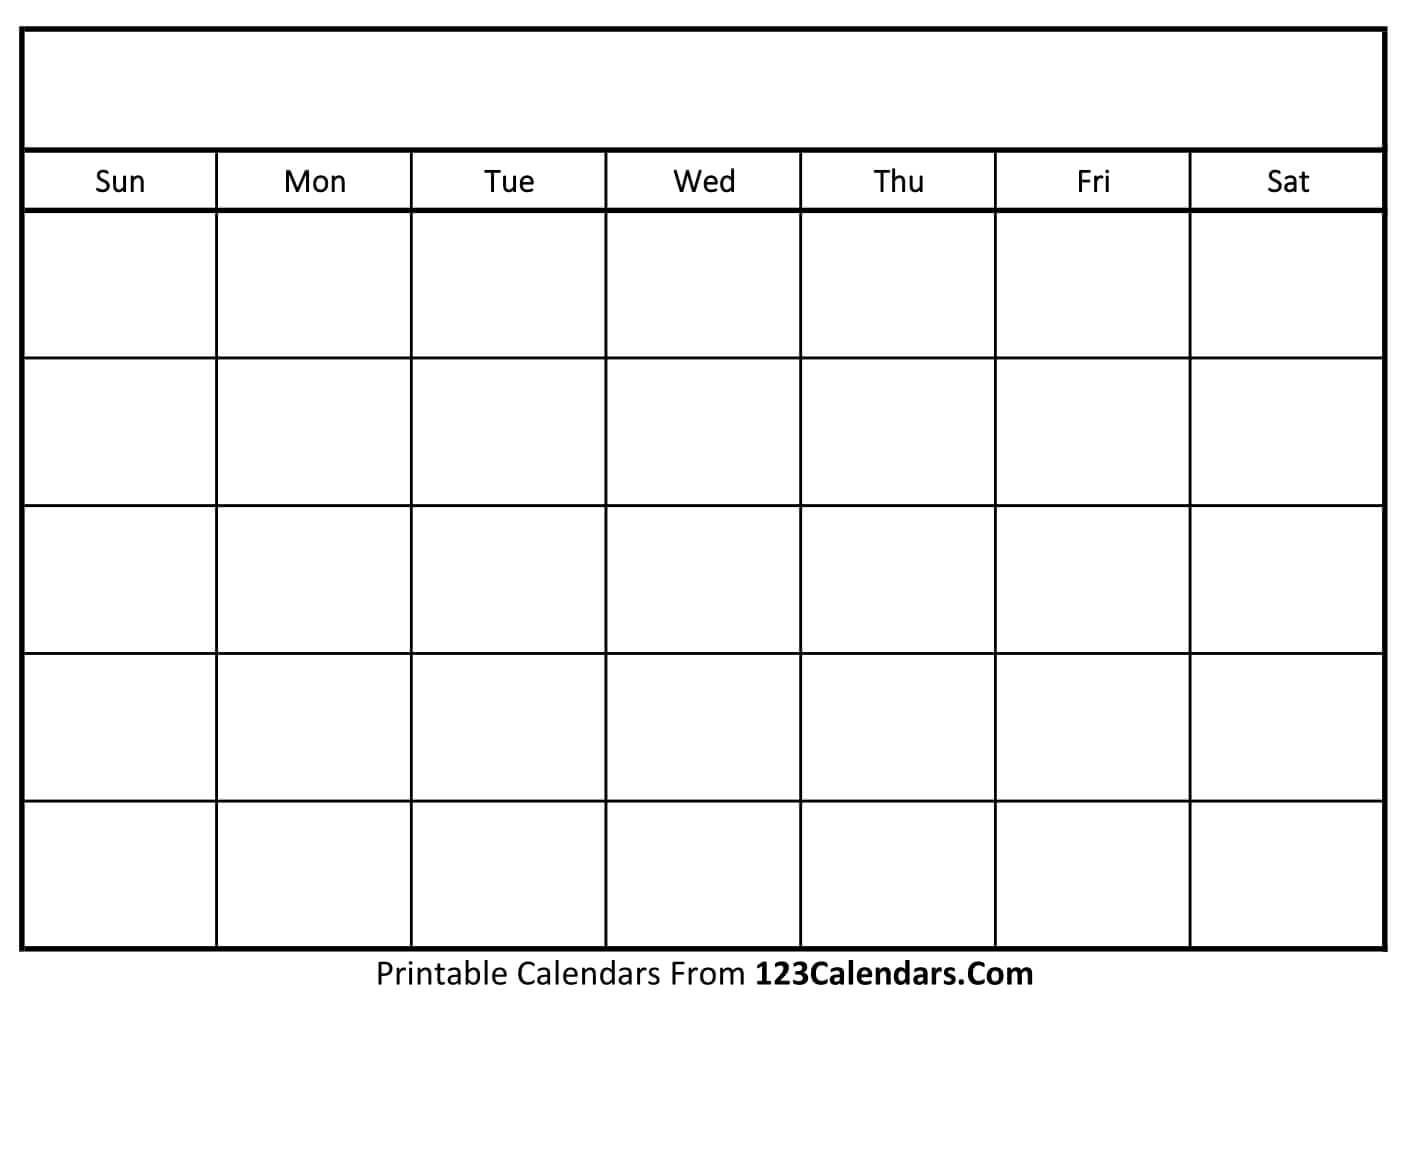 Free Printable Blank Calendar | 123Calendars